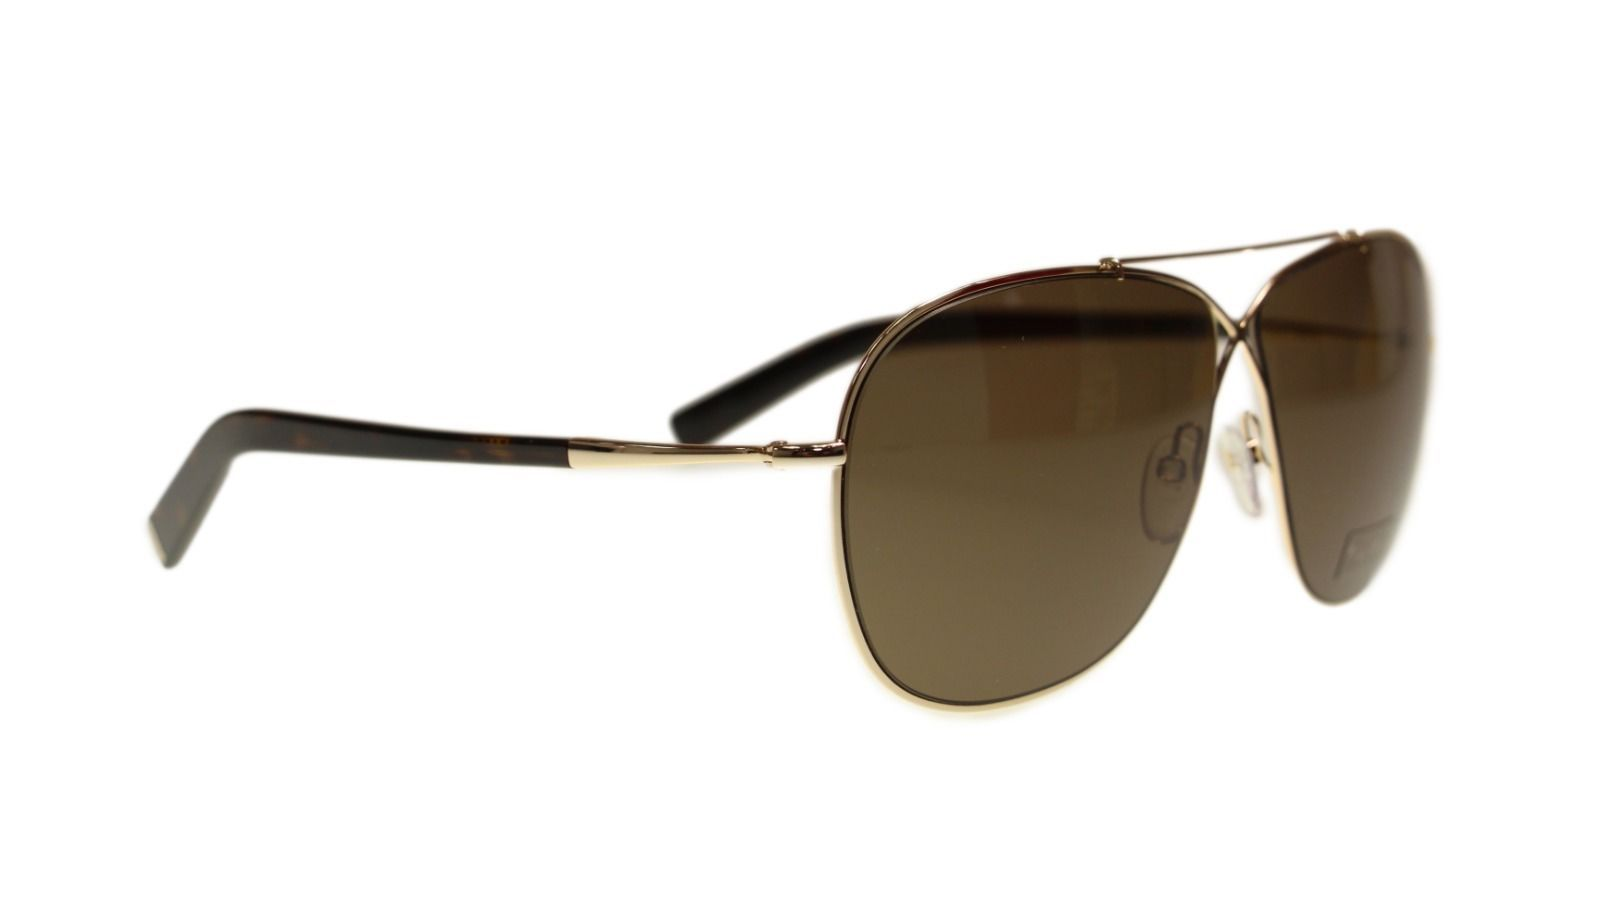 53438ab870f47 Tom Ford April Men s Sunglasses FT0393 28J Shiny Rose Gold Aviator Authentic